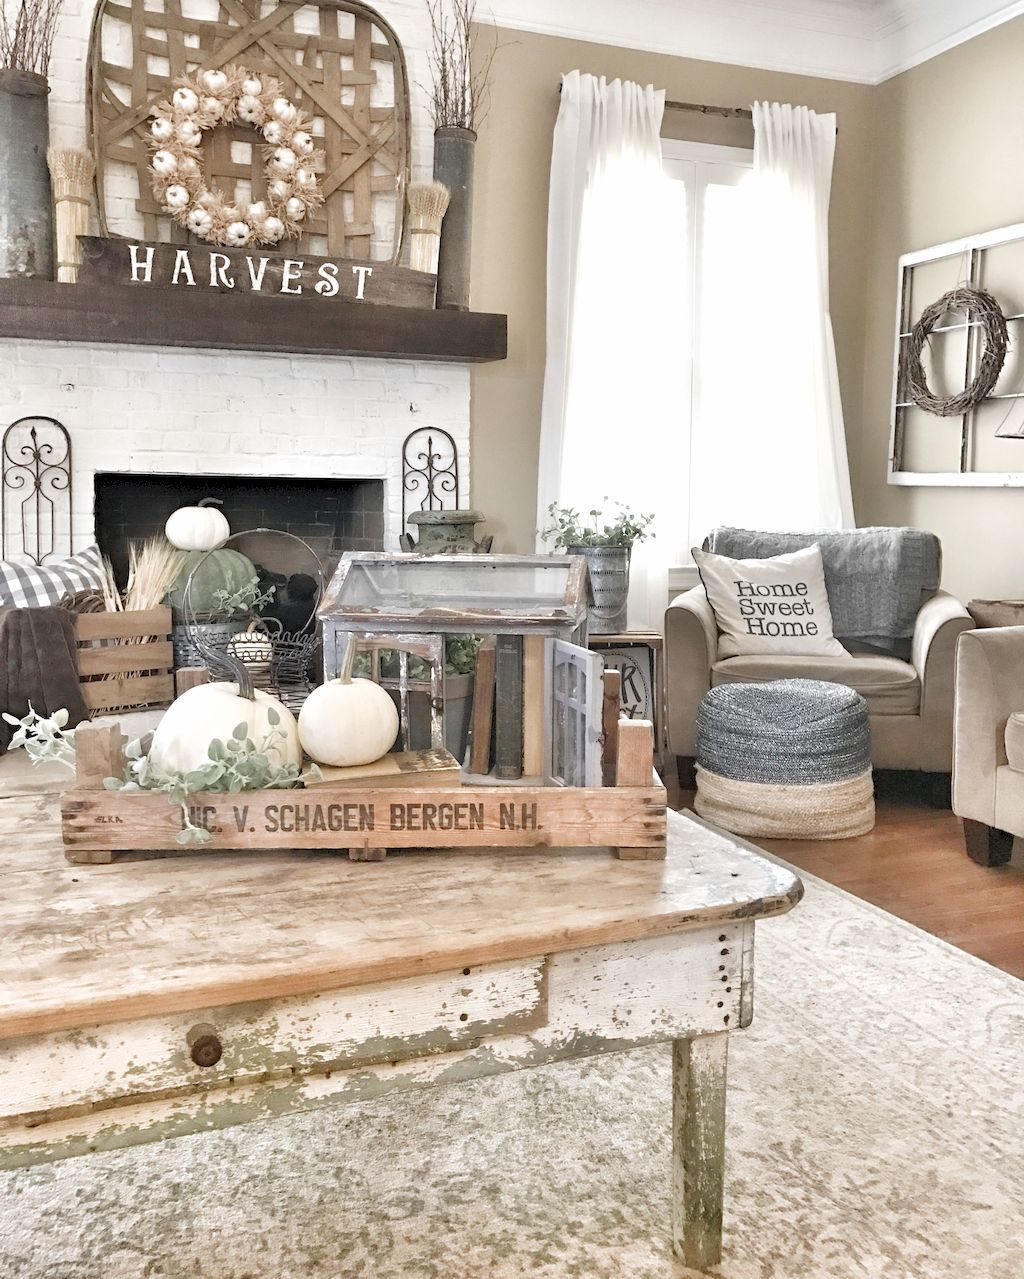 Country Farmhouse Interior Designs: Rustic Farmhouse Living Room Design And Decor Ideas (41